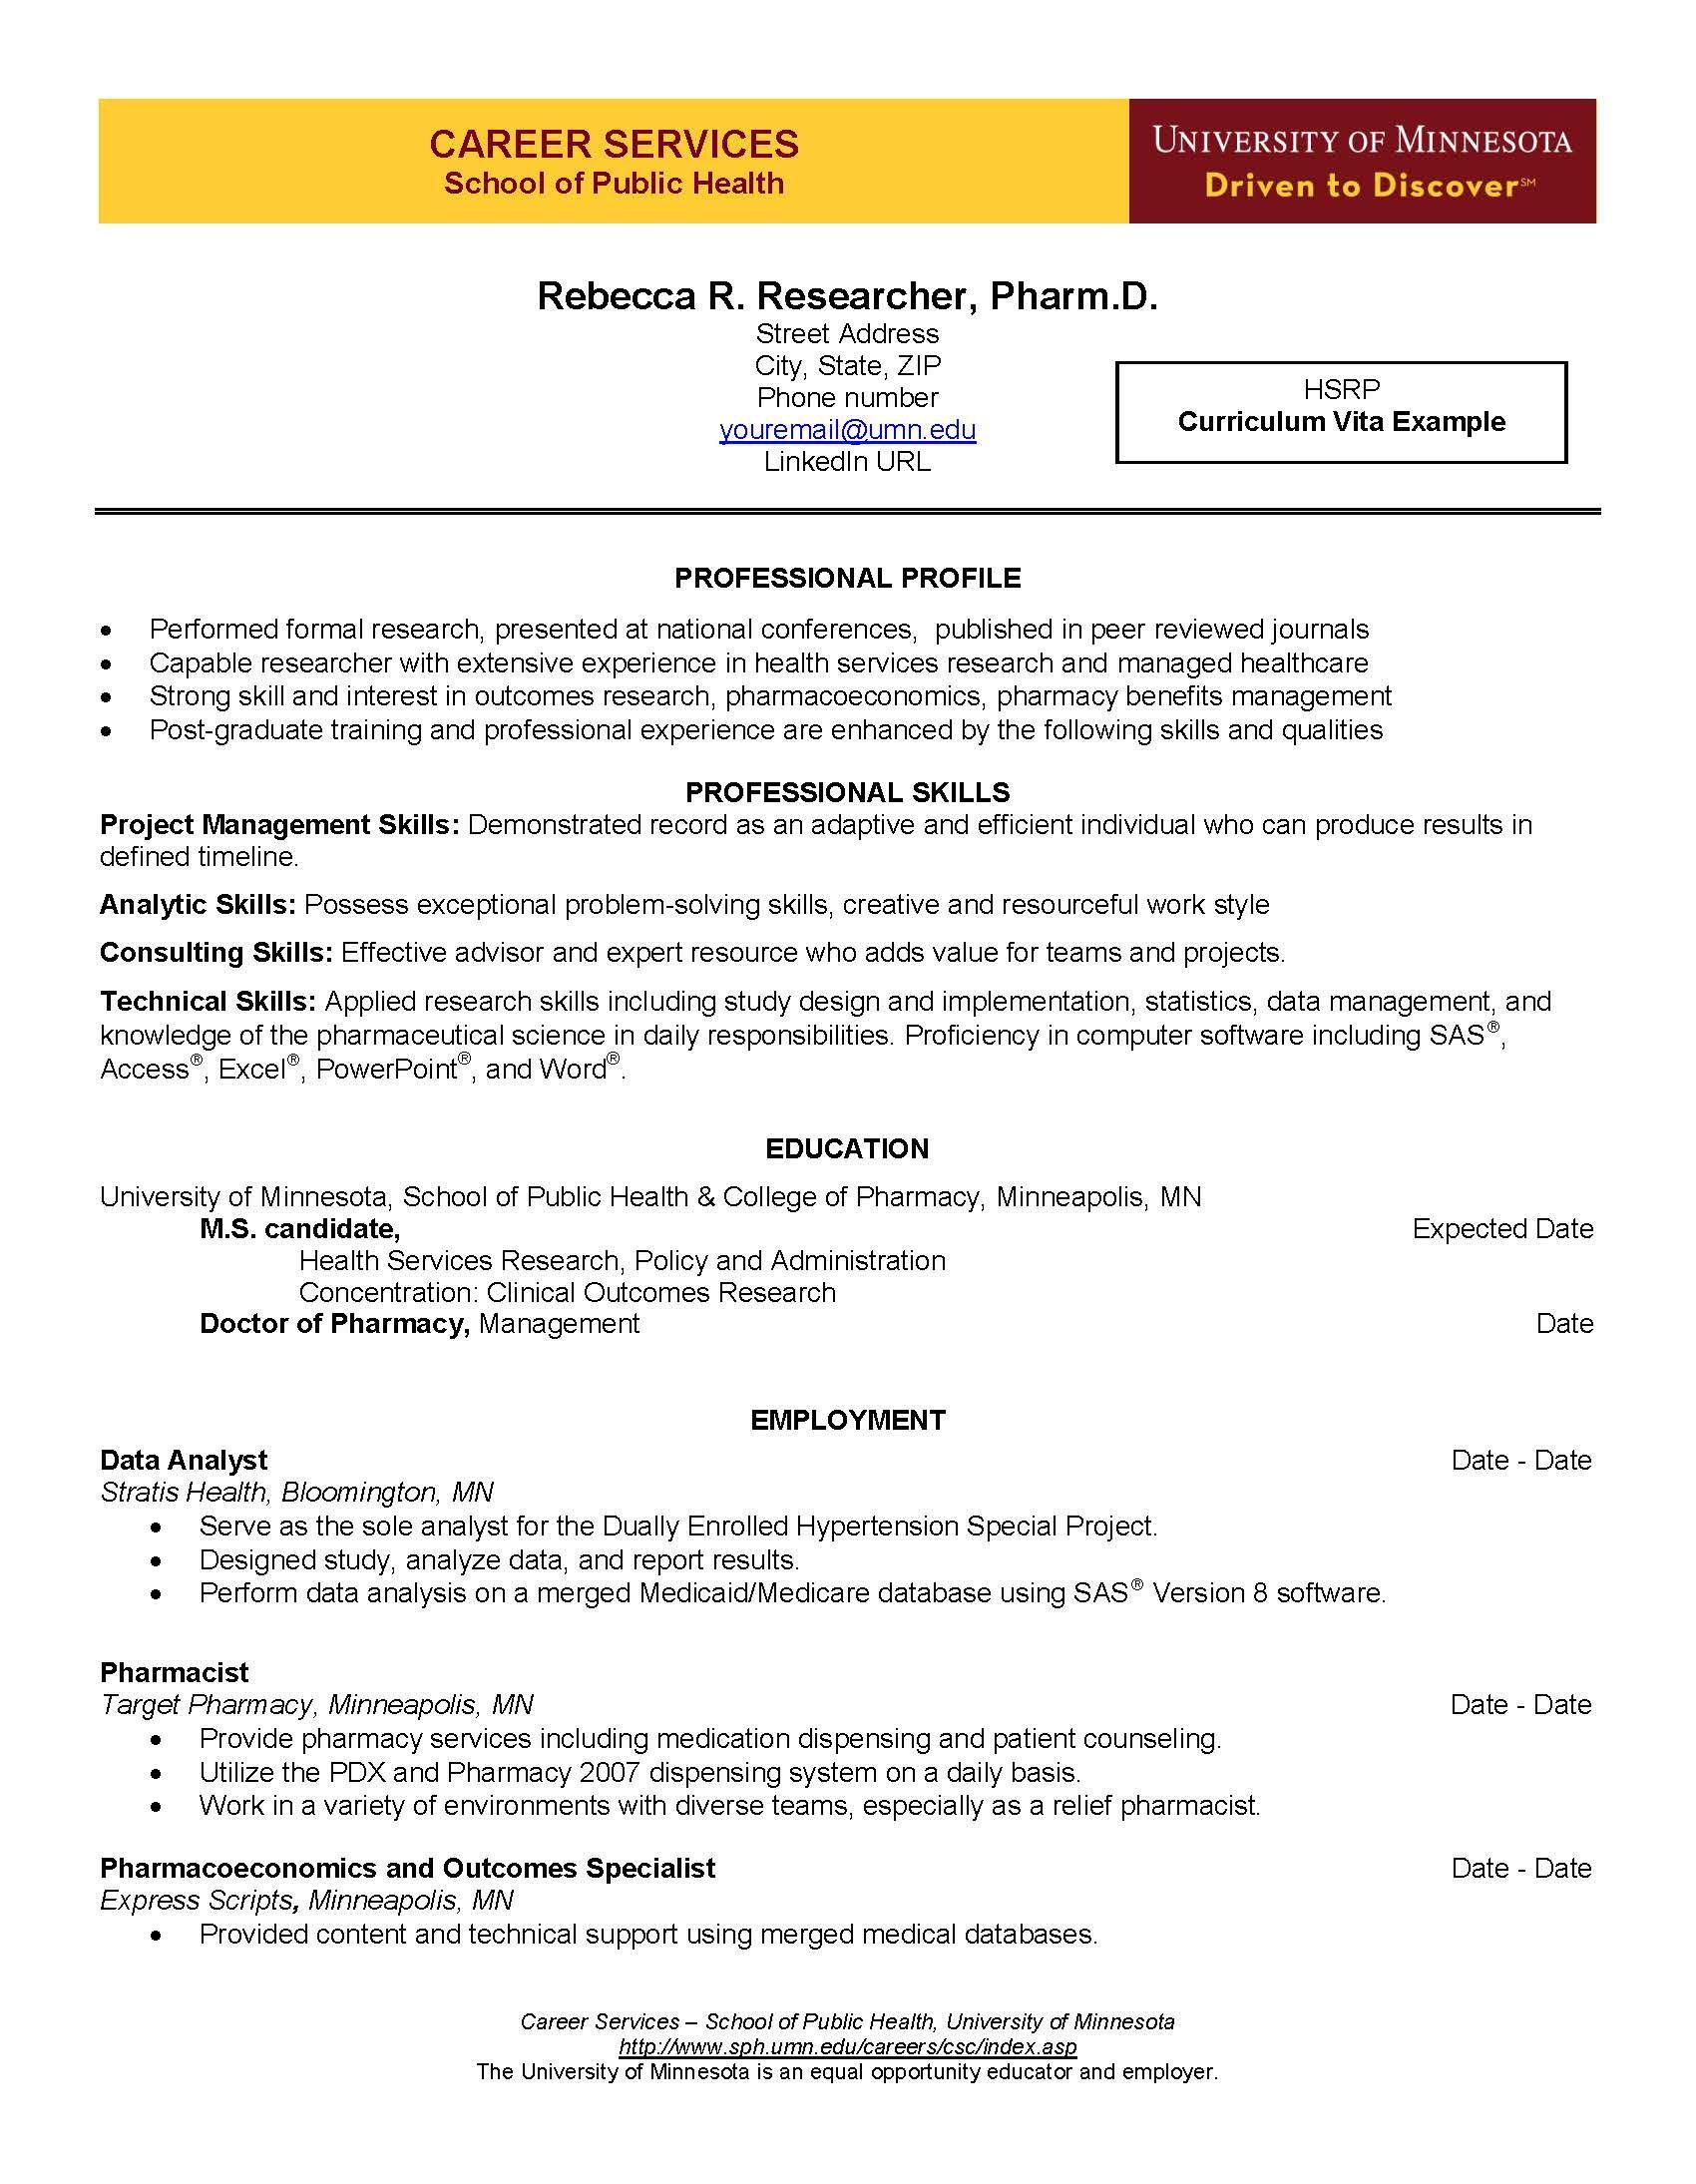 cv example page 1 curriculum vita guide pinterest cv examples